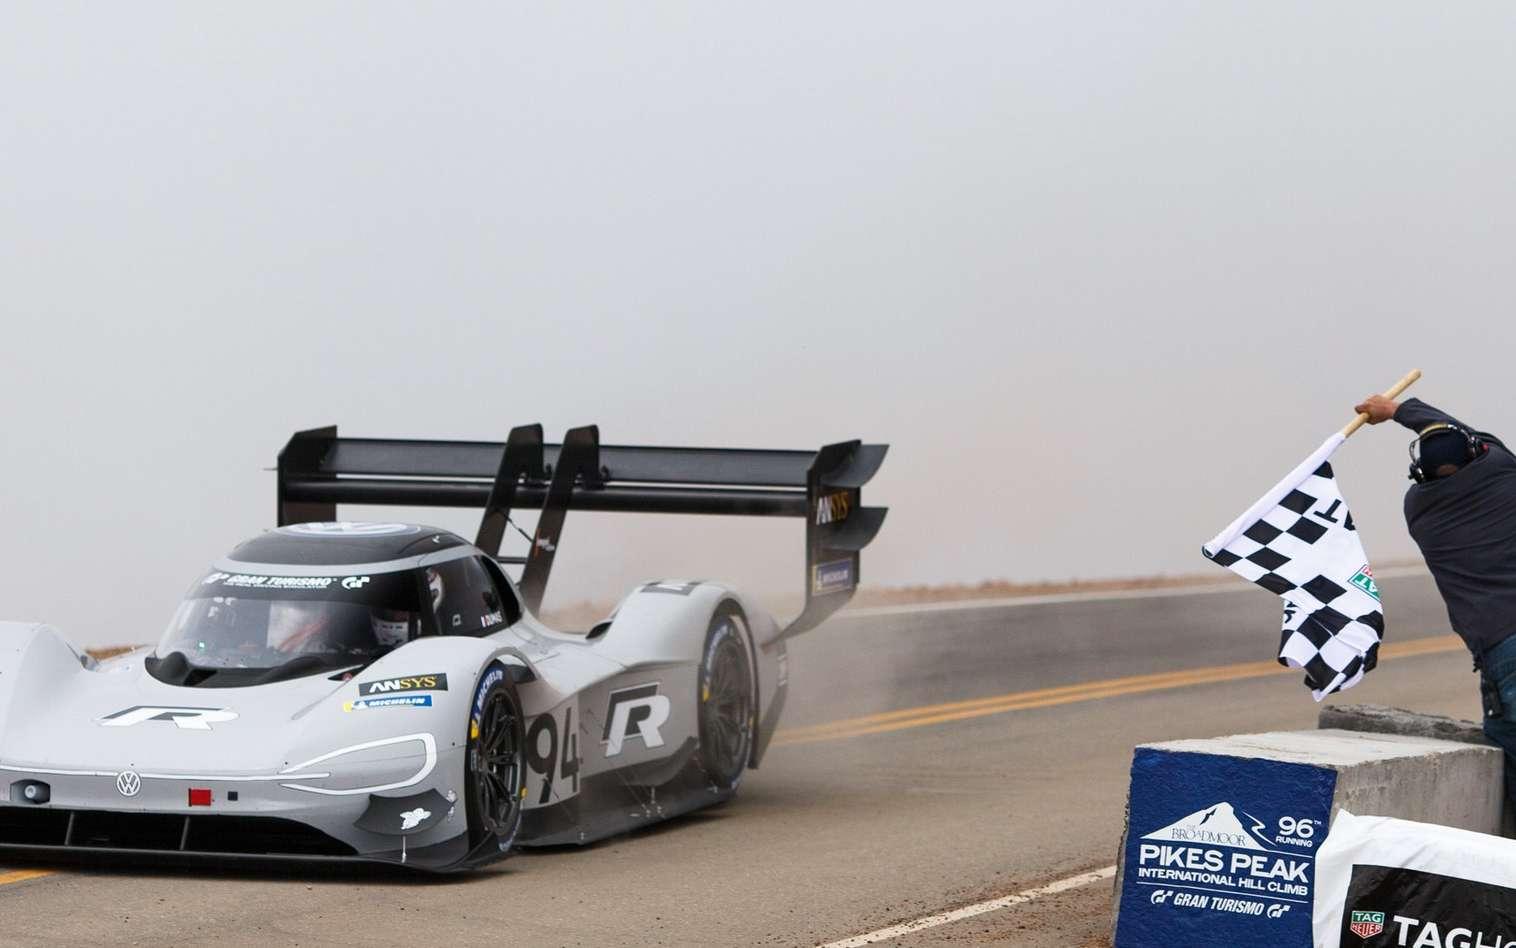 La voiture de course électrique ID R Pikes Peak de Volkswagen. © Volkswagen